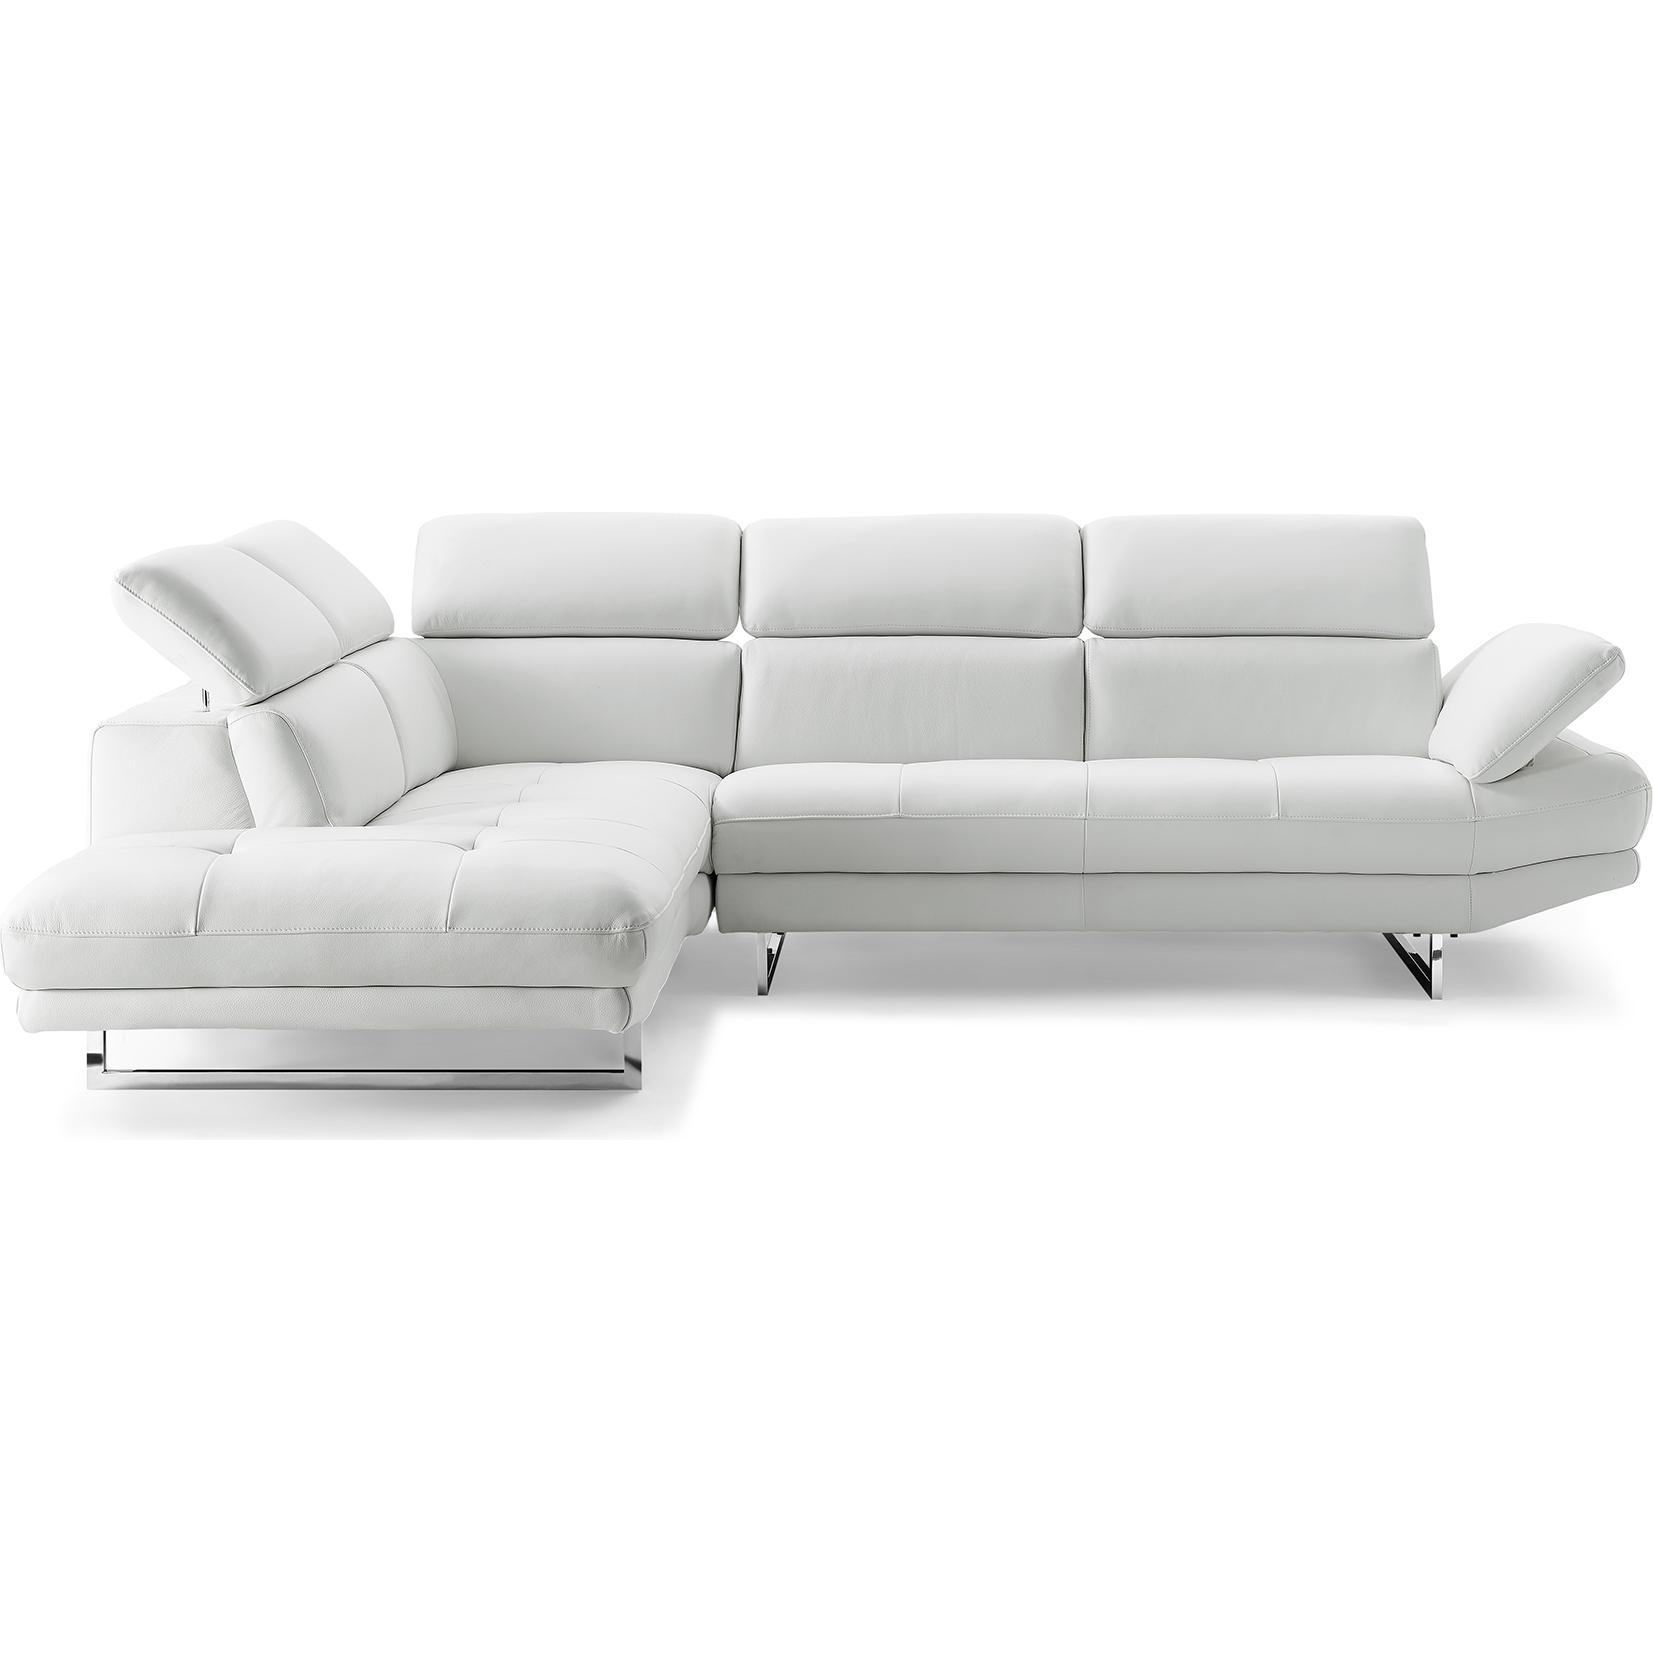 Whiteline Imports SL1351L WHT Pandora Sectional Sofa w Chaise on